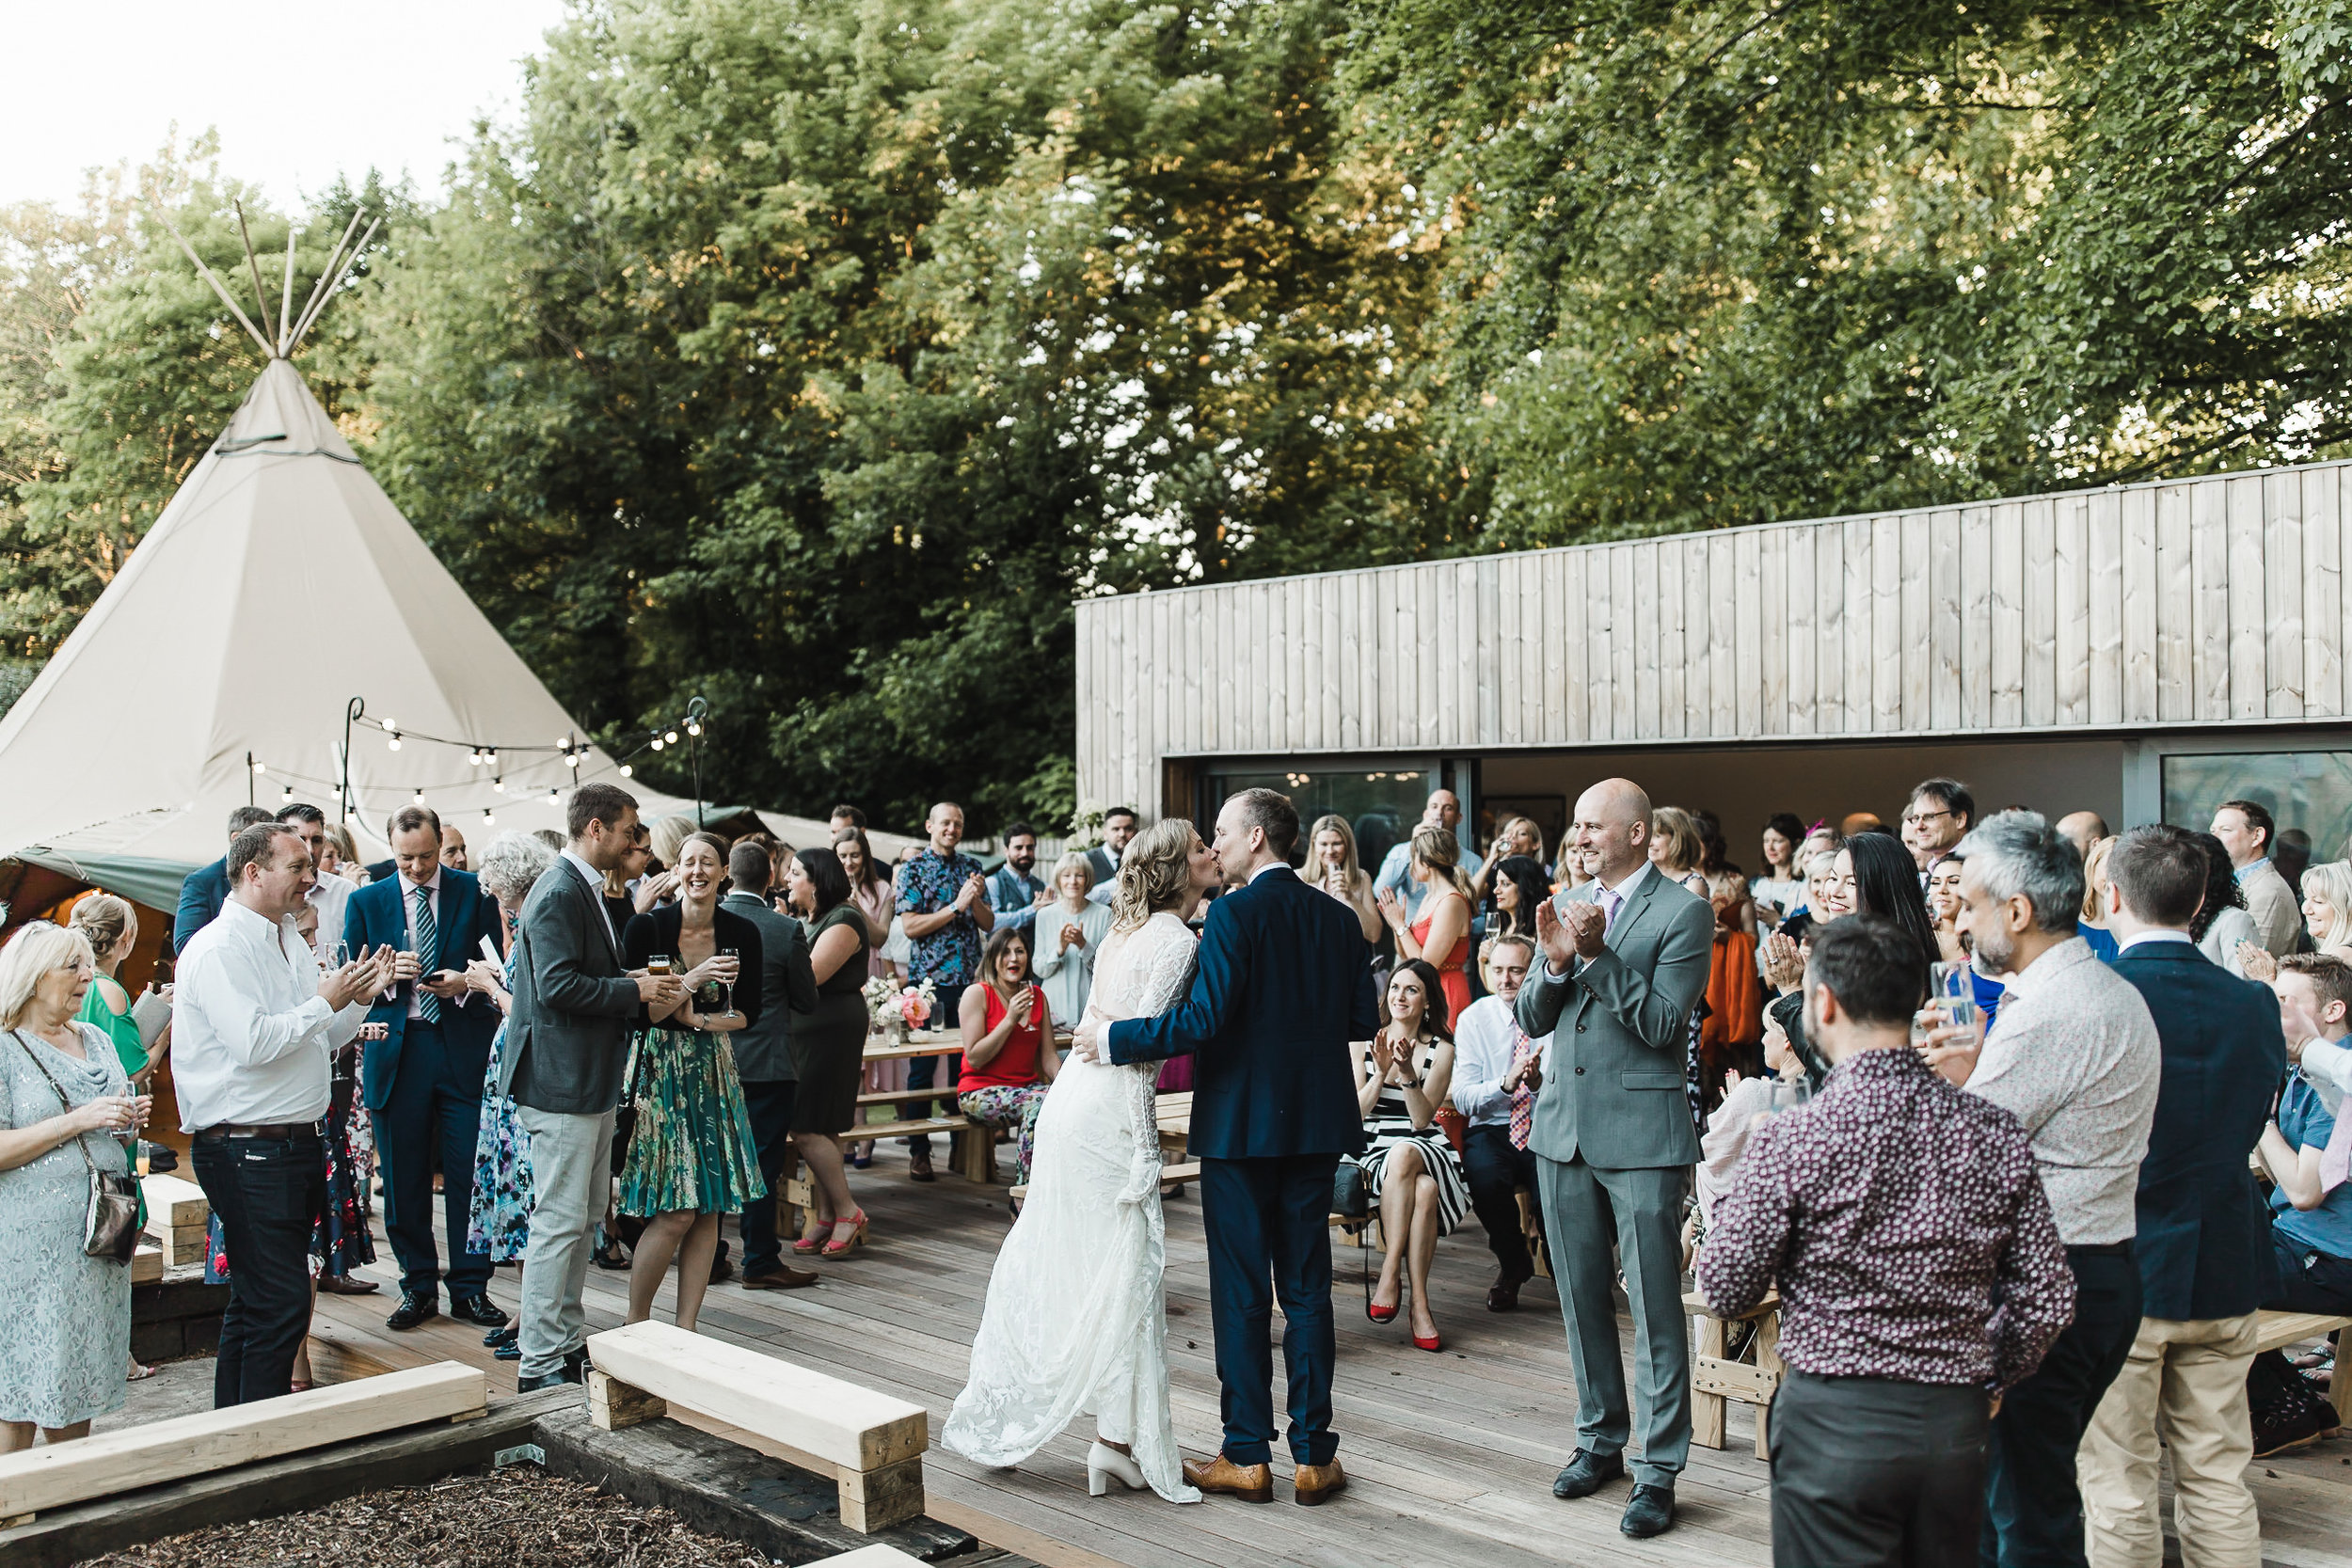 Roundhay-Leeds-Backyard-Wedding-Becs-Chris-220.jpg